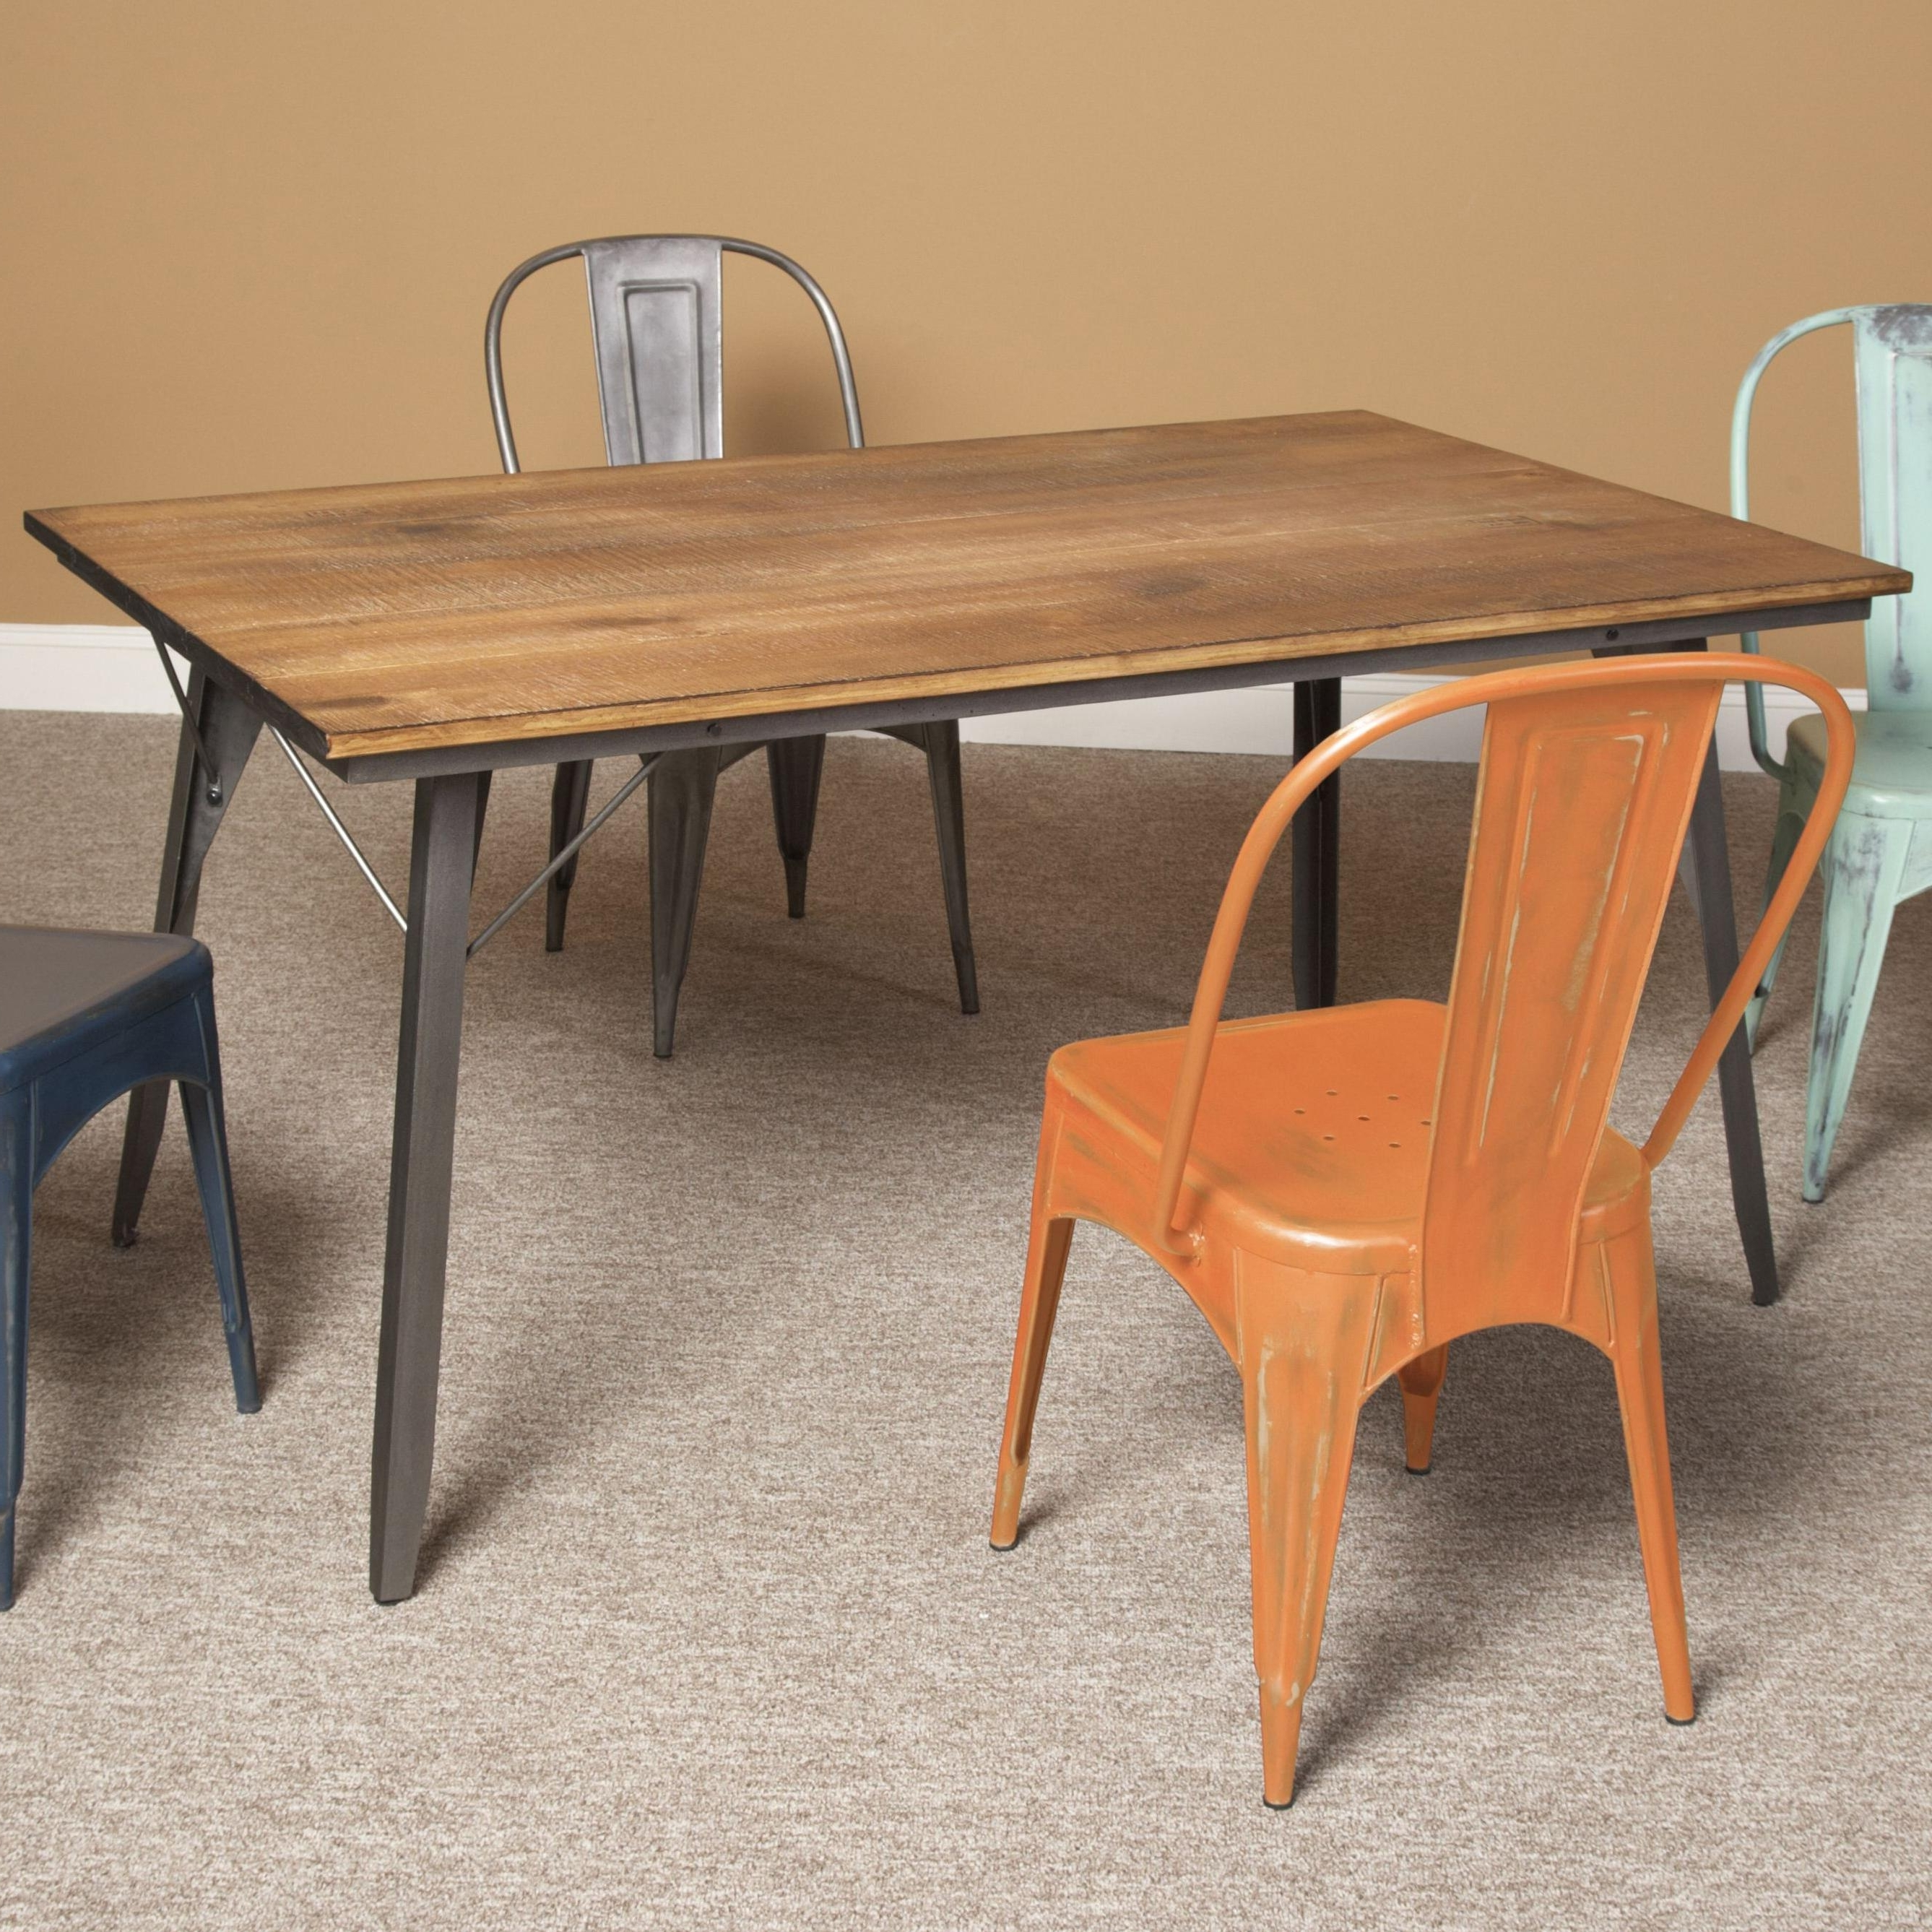 Largo Timbuktu Wood & Metal Rectangular Dining Table (View 22 of 25)